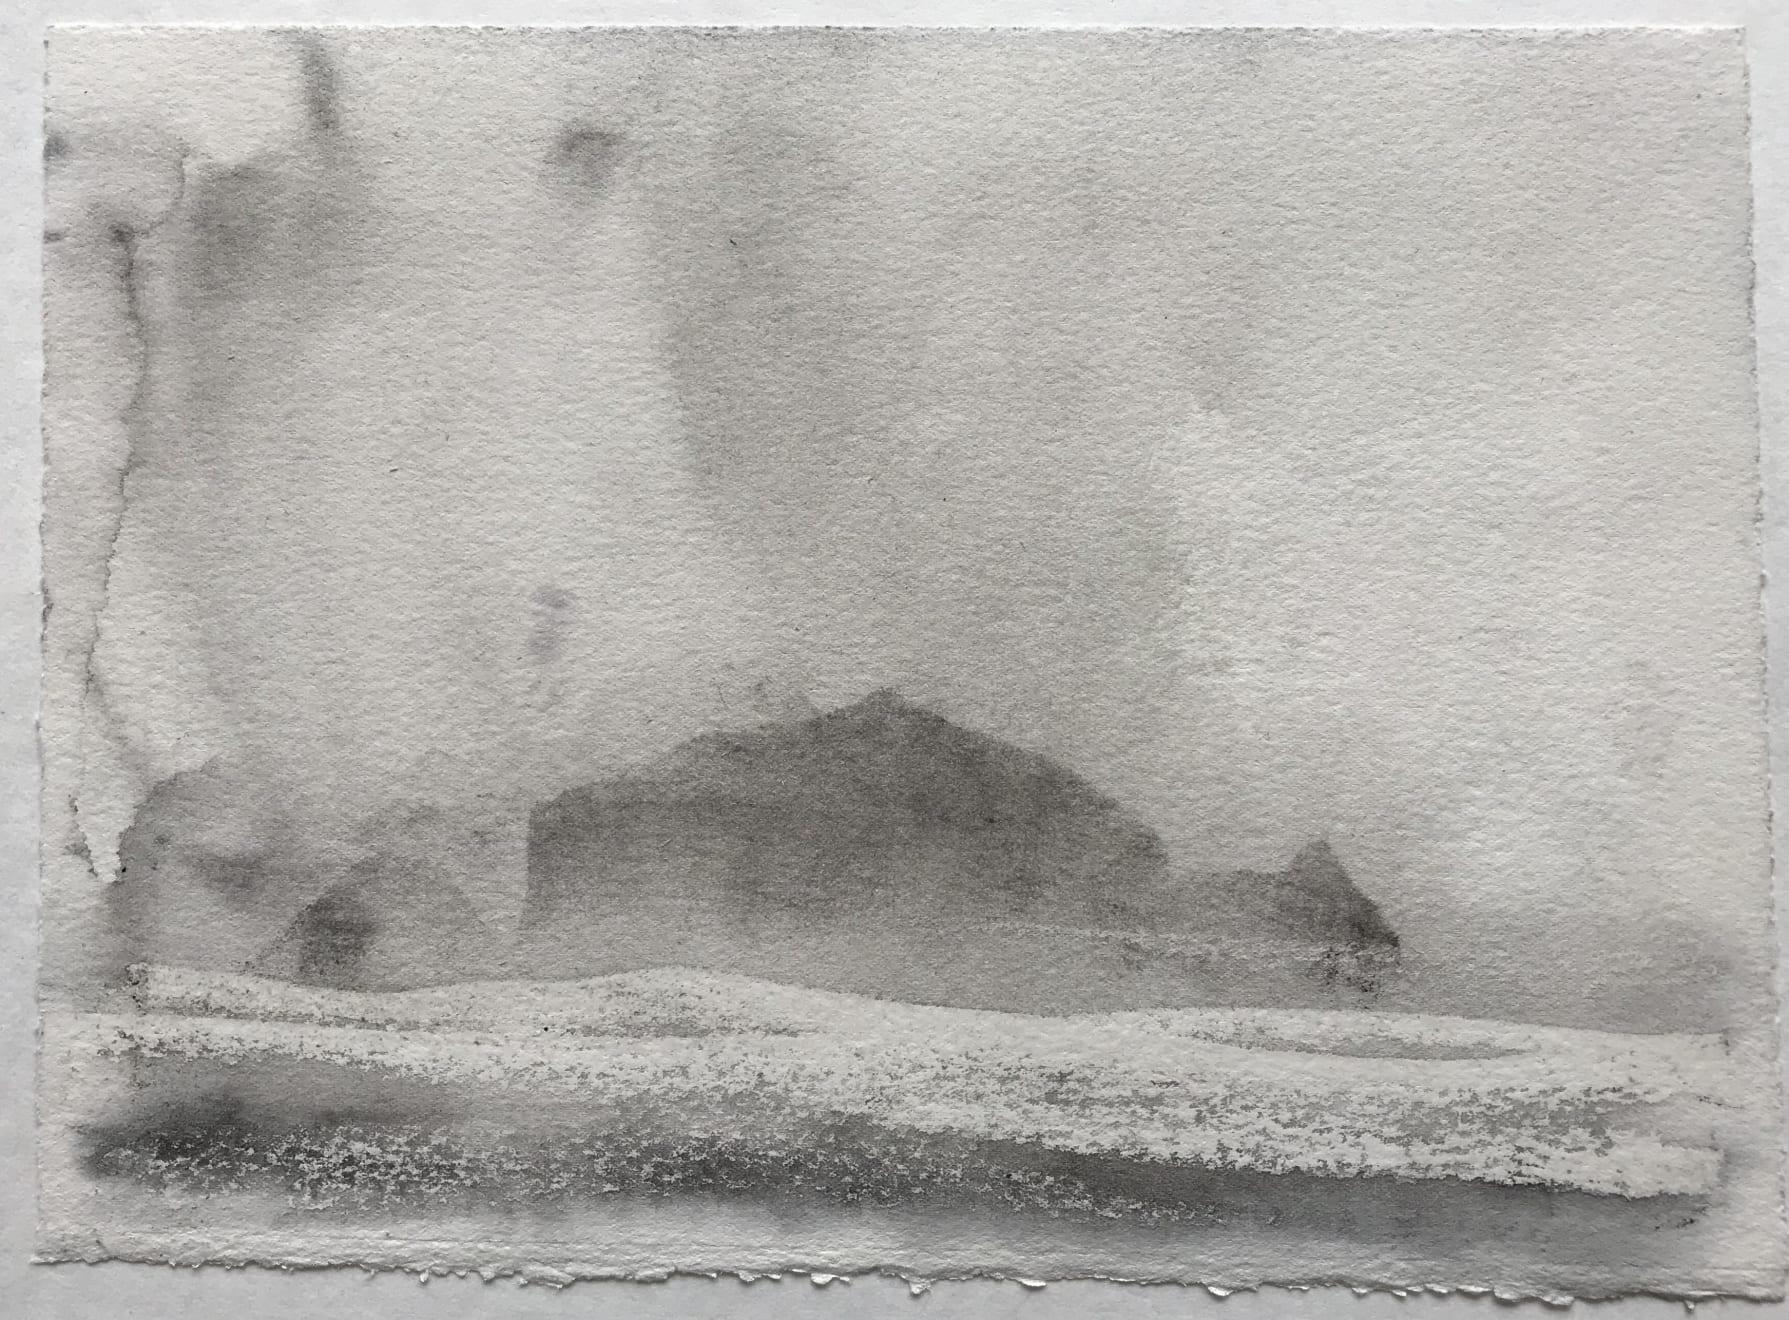 Jason Hicklin, South Gut, Grassholm Island, 2020